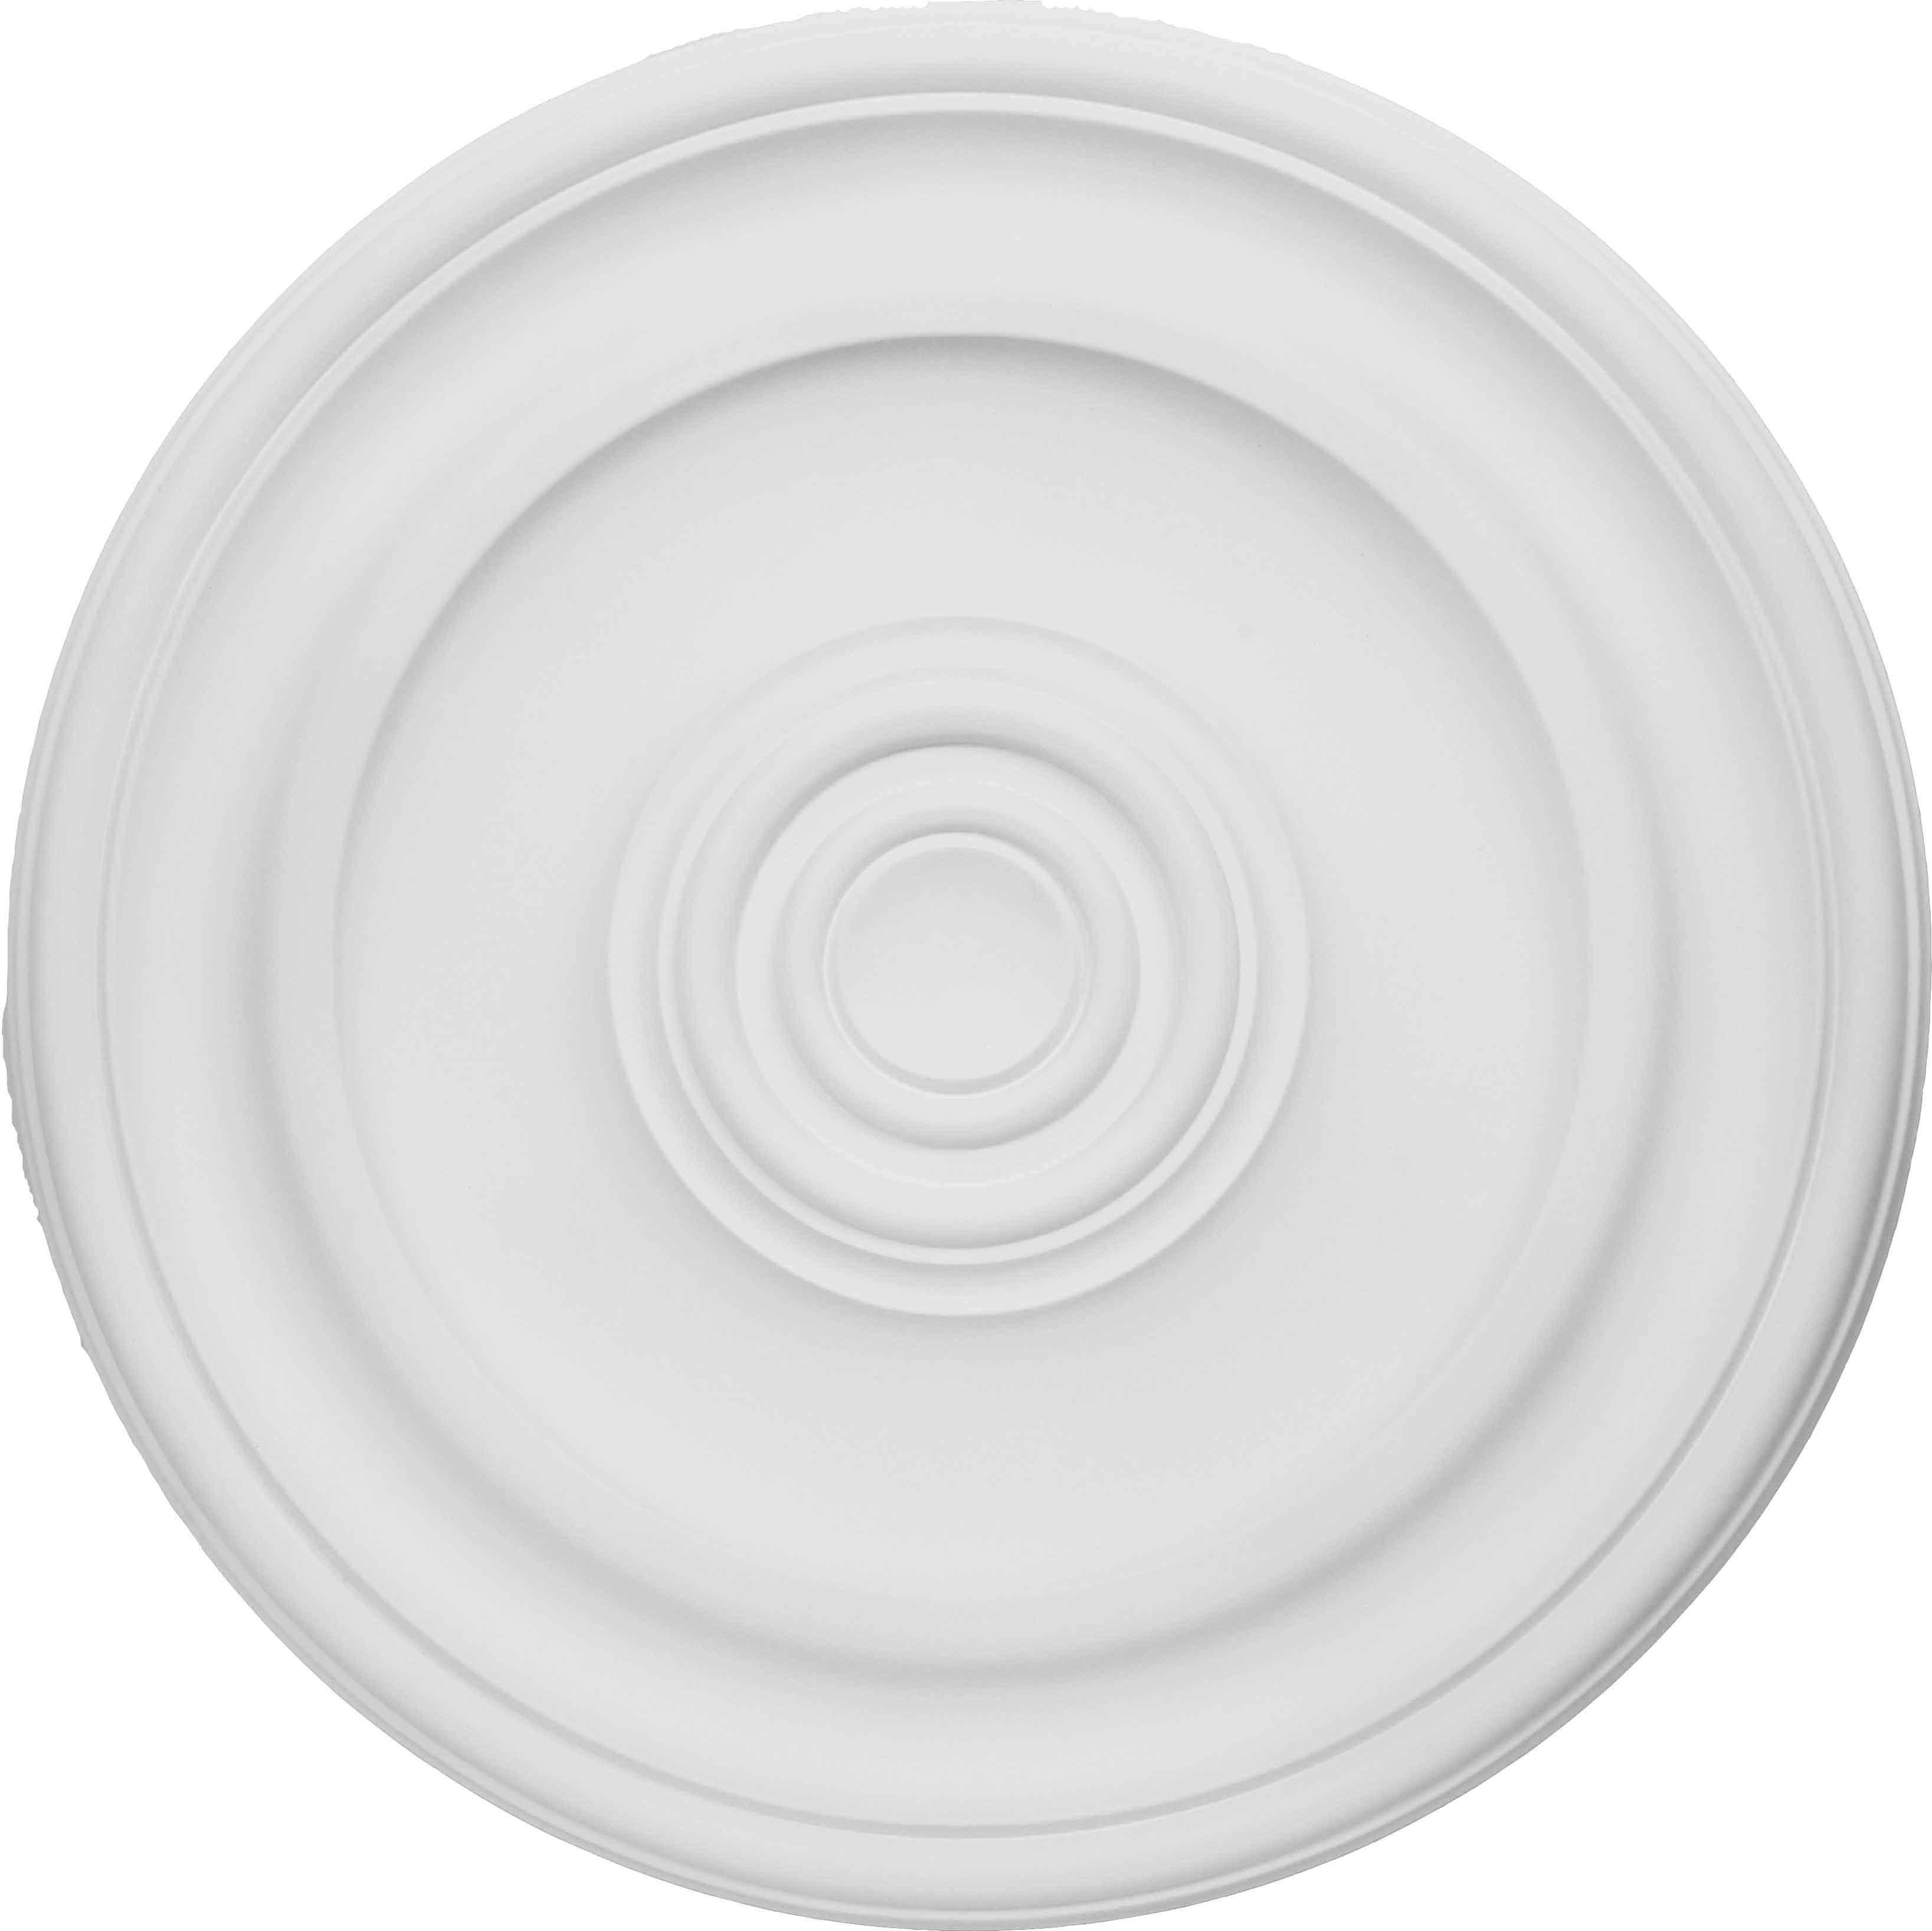 Розетка Decomaster  DM 0405 (O 500  h=37)